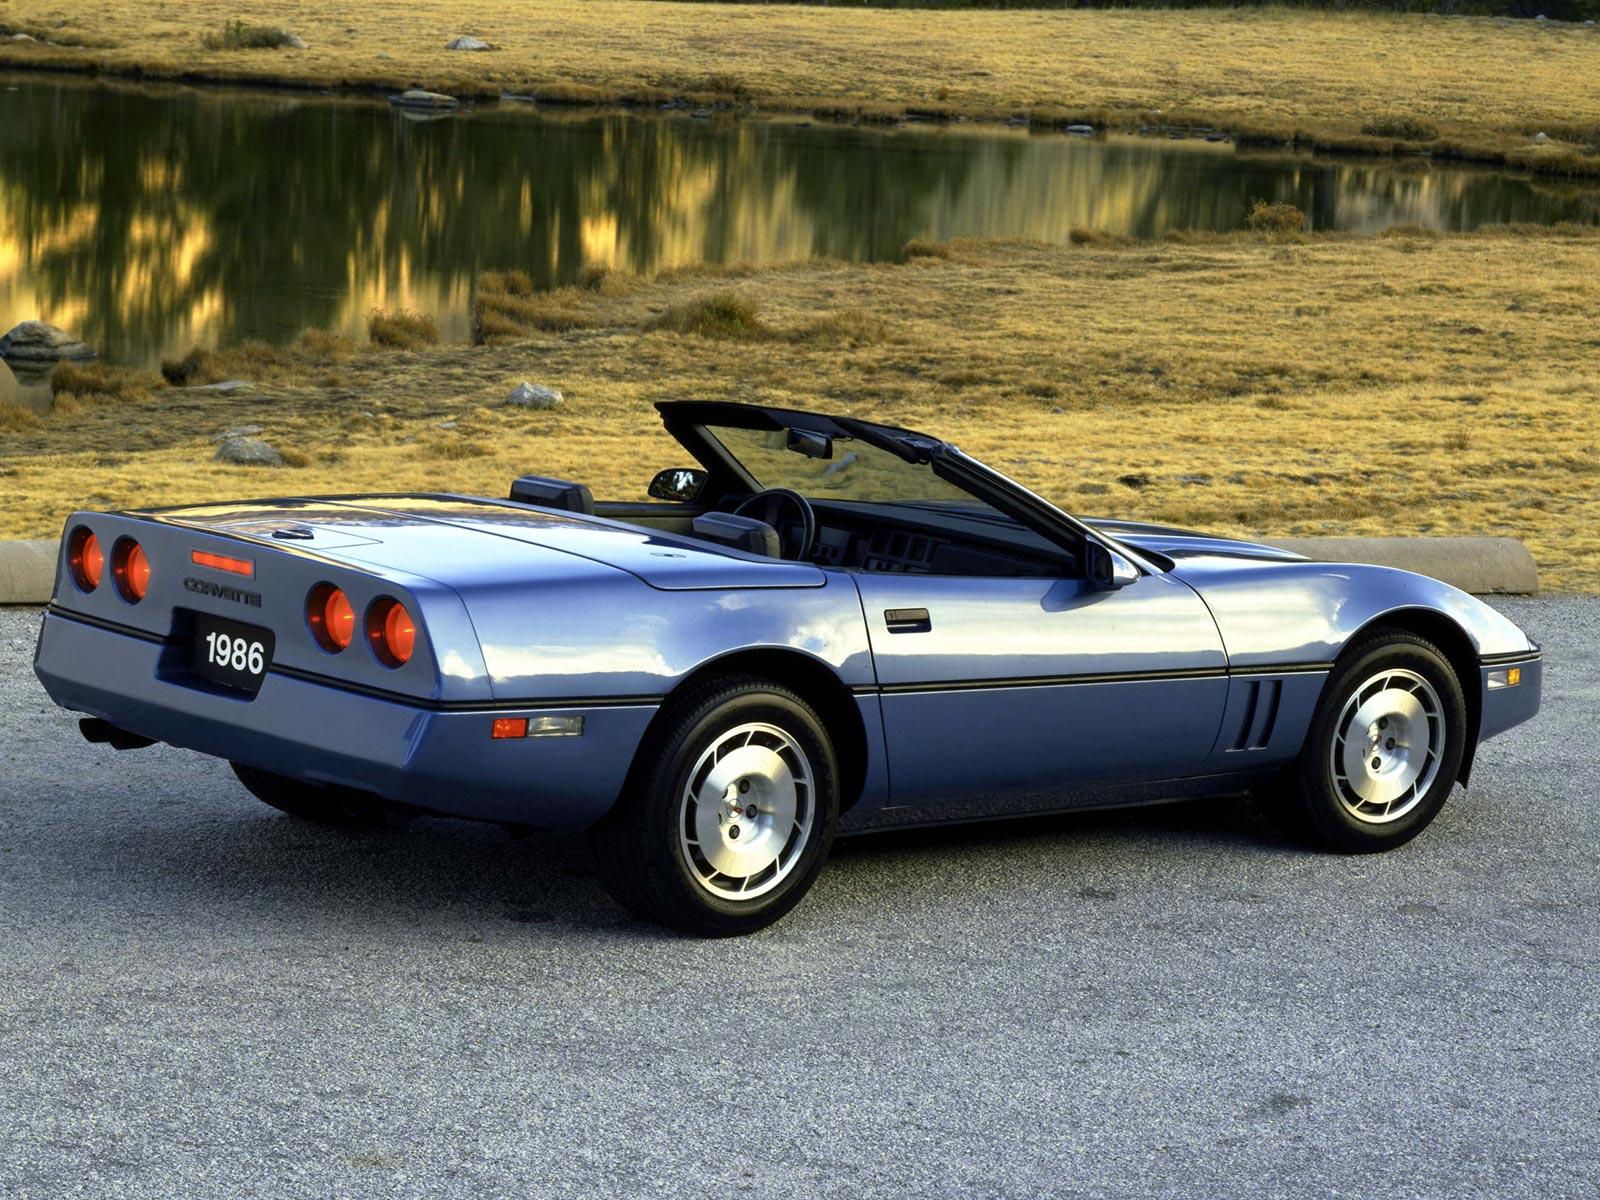 1986 Chevrolet Corvette Cabrio (c) Chevrolet